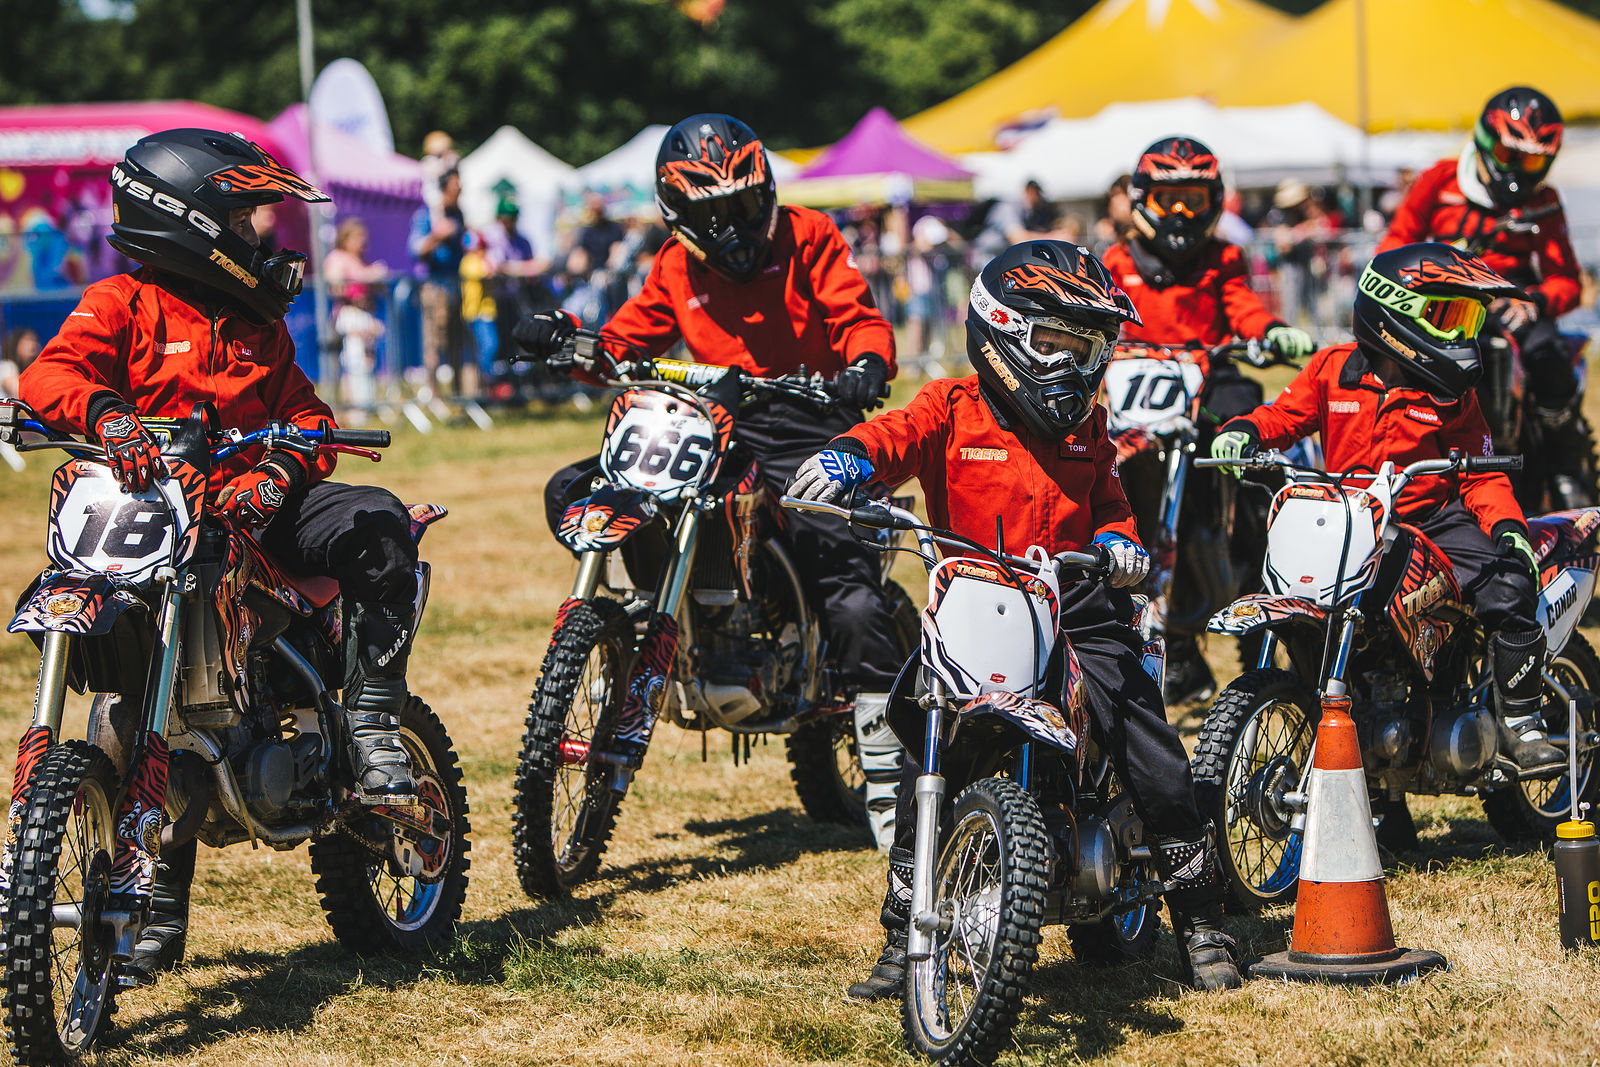 The Tigers Motorcycle Display